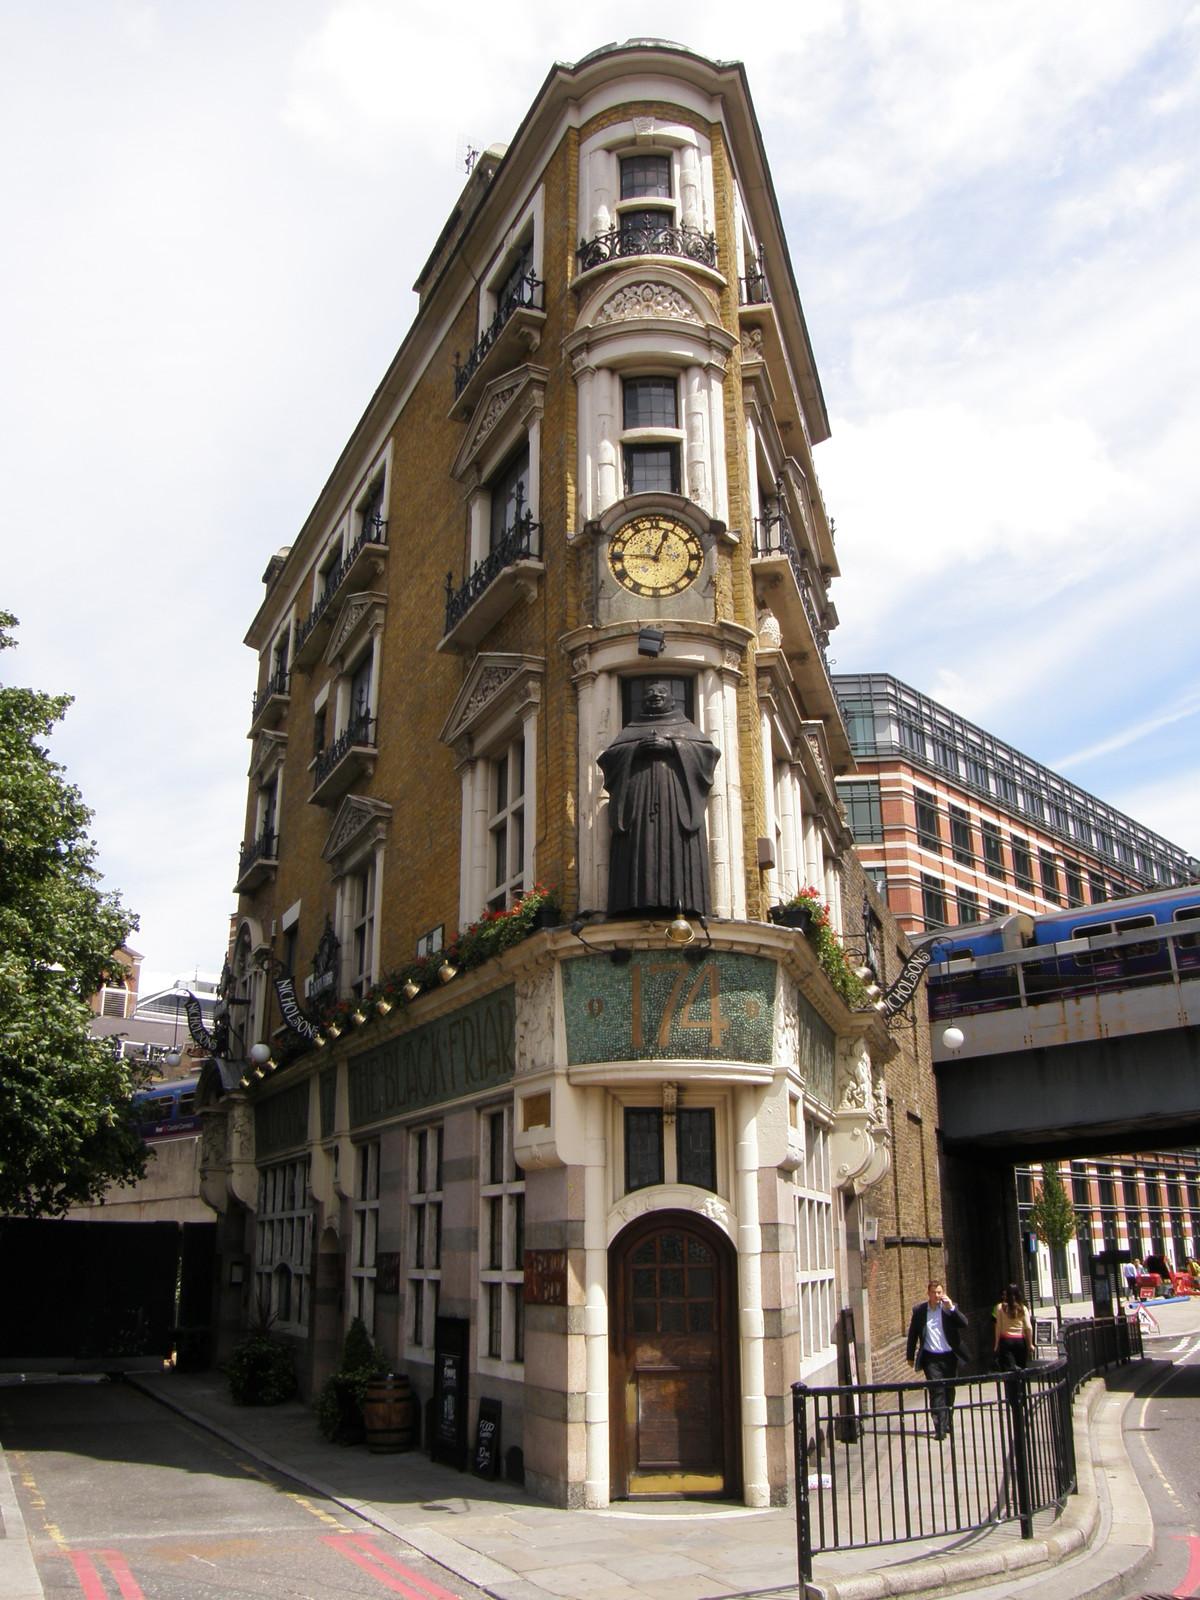 London Iphone X Wallpaper The Black Friar Pub Opposite Blackfriars Station A